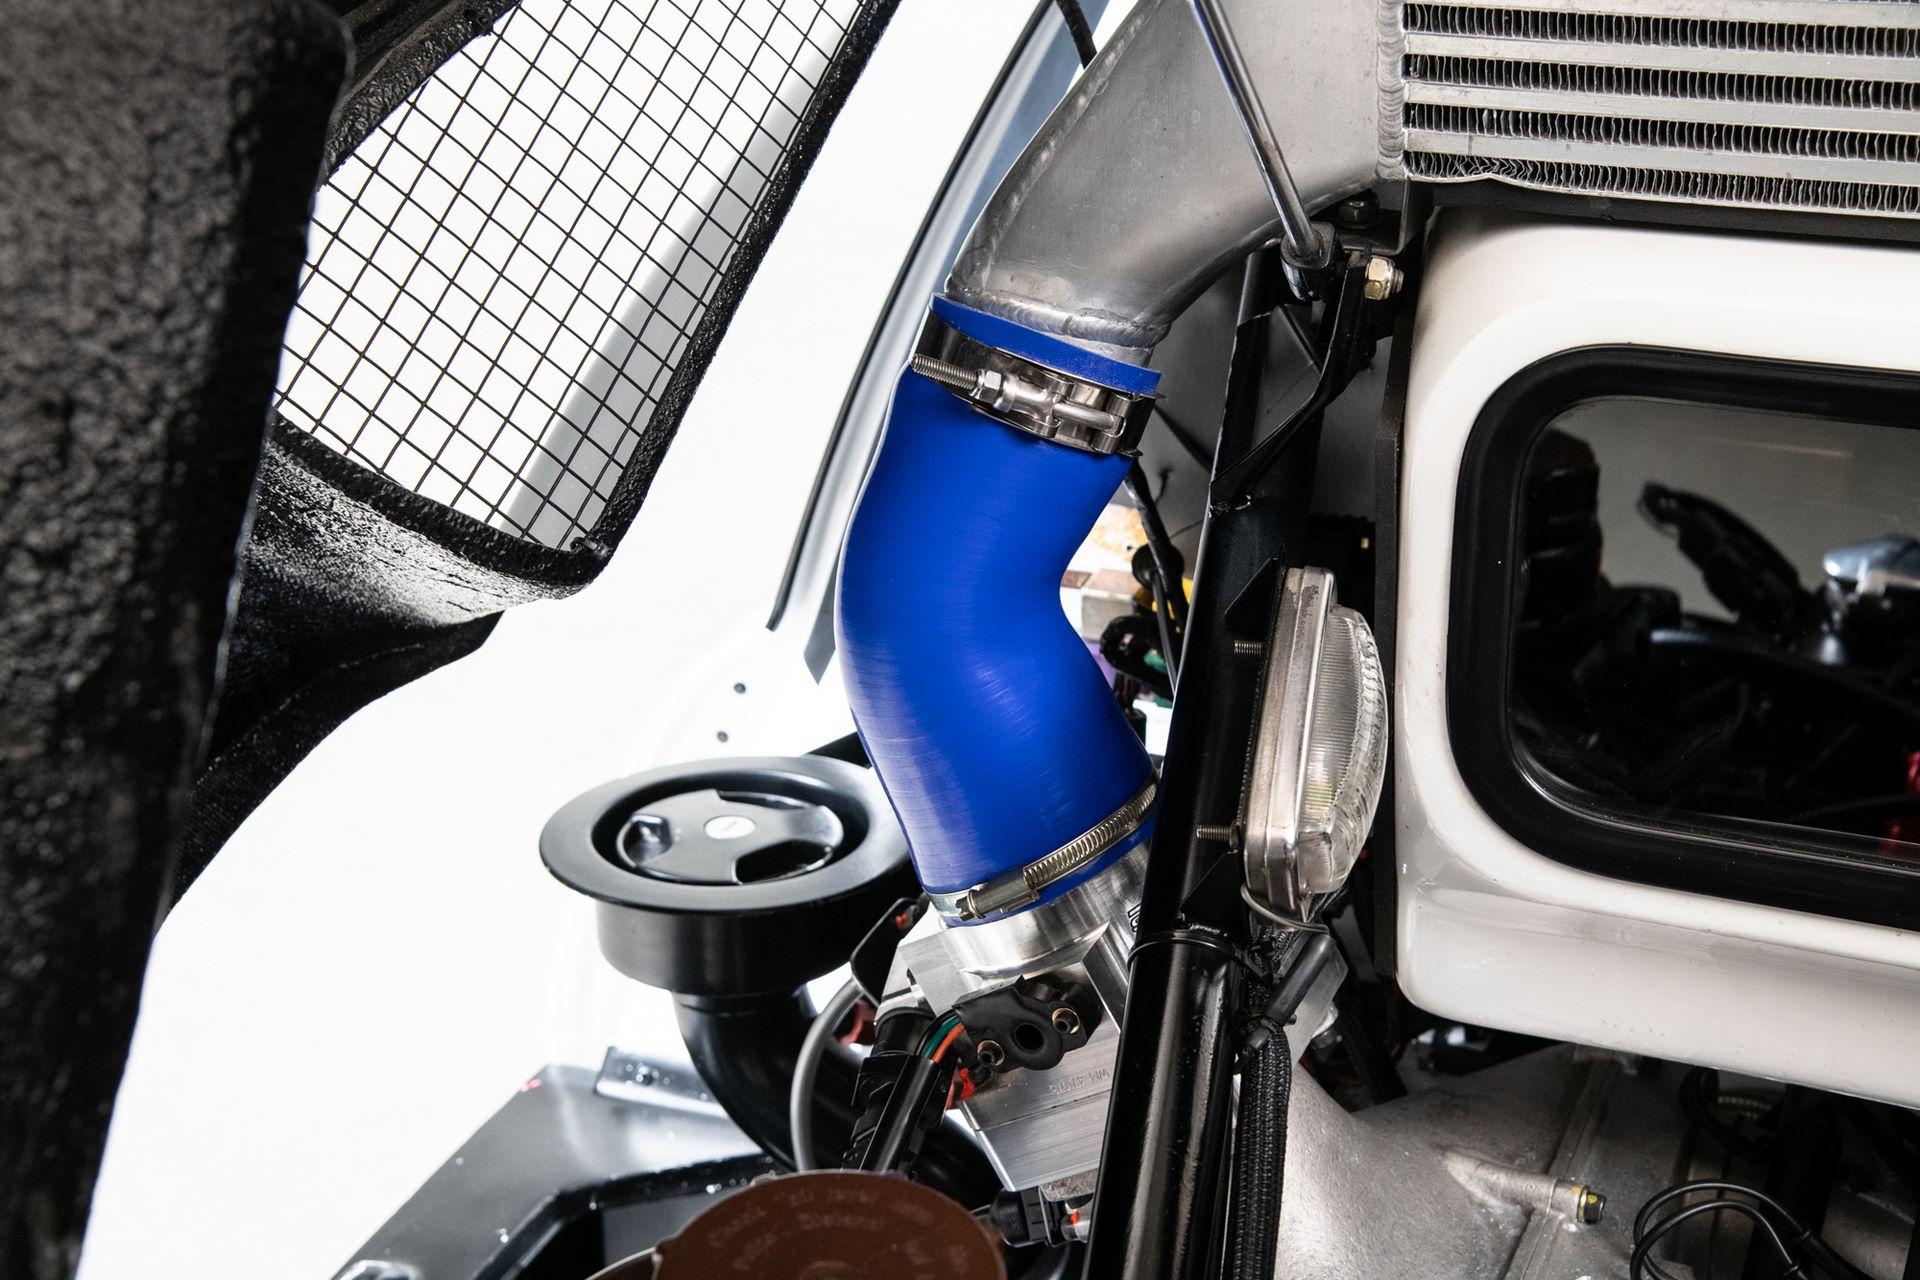 Ford-RS200-Evolution-Evo-for-sale-47